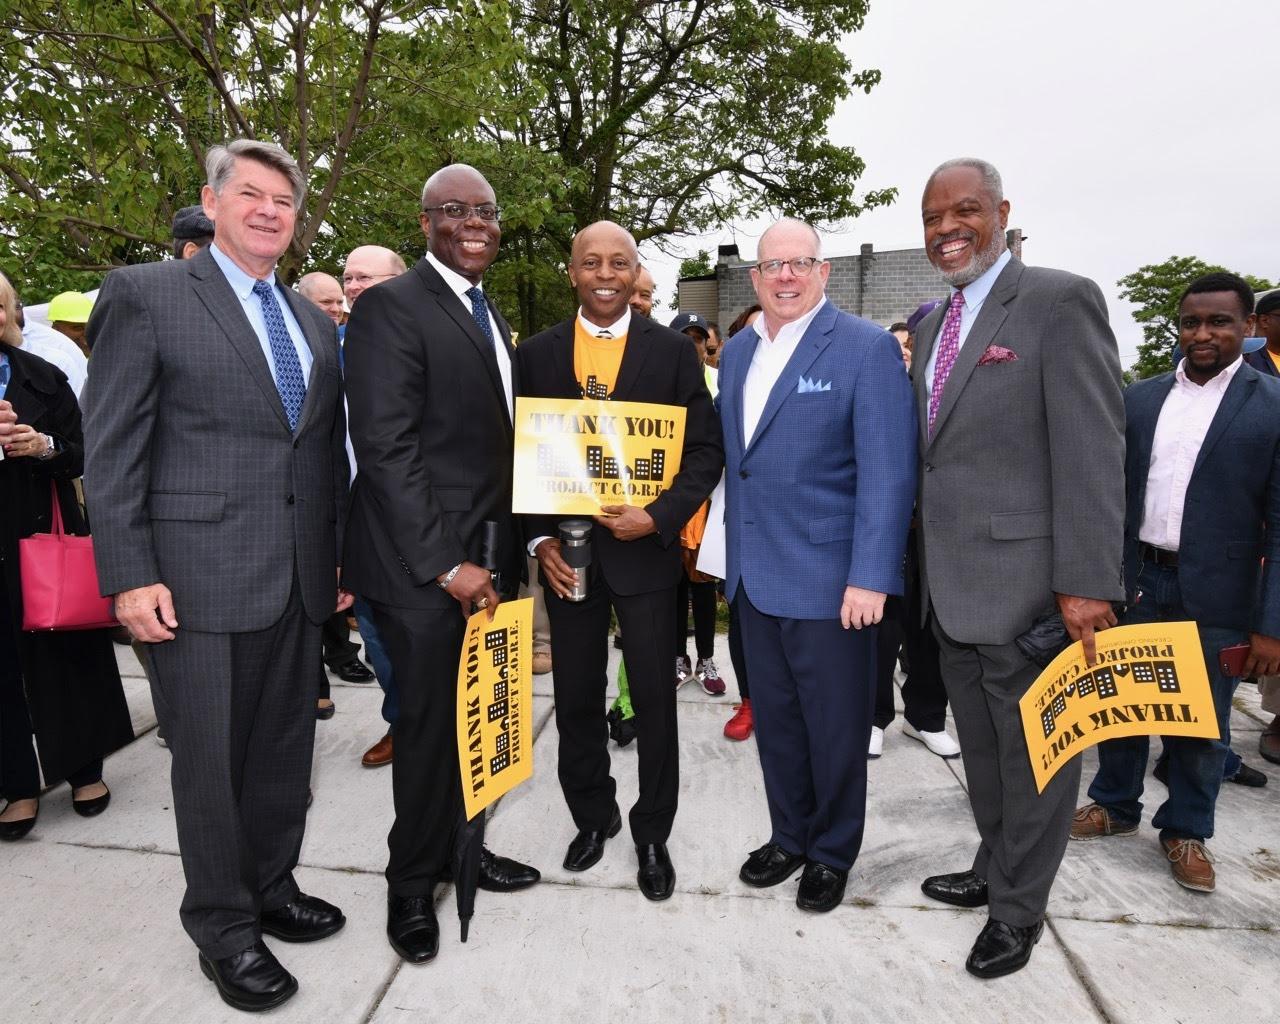 Project C.O.R.E. Marks Major Milestone in City's Fight Against Blight